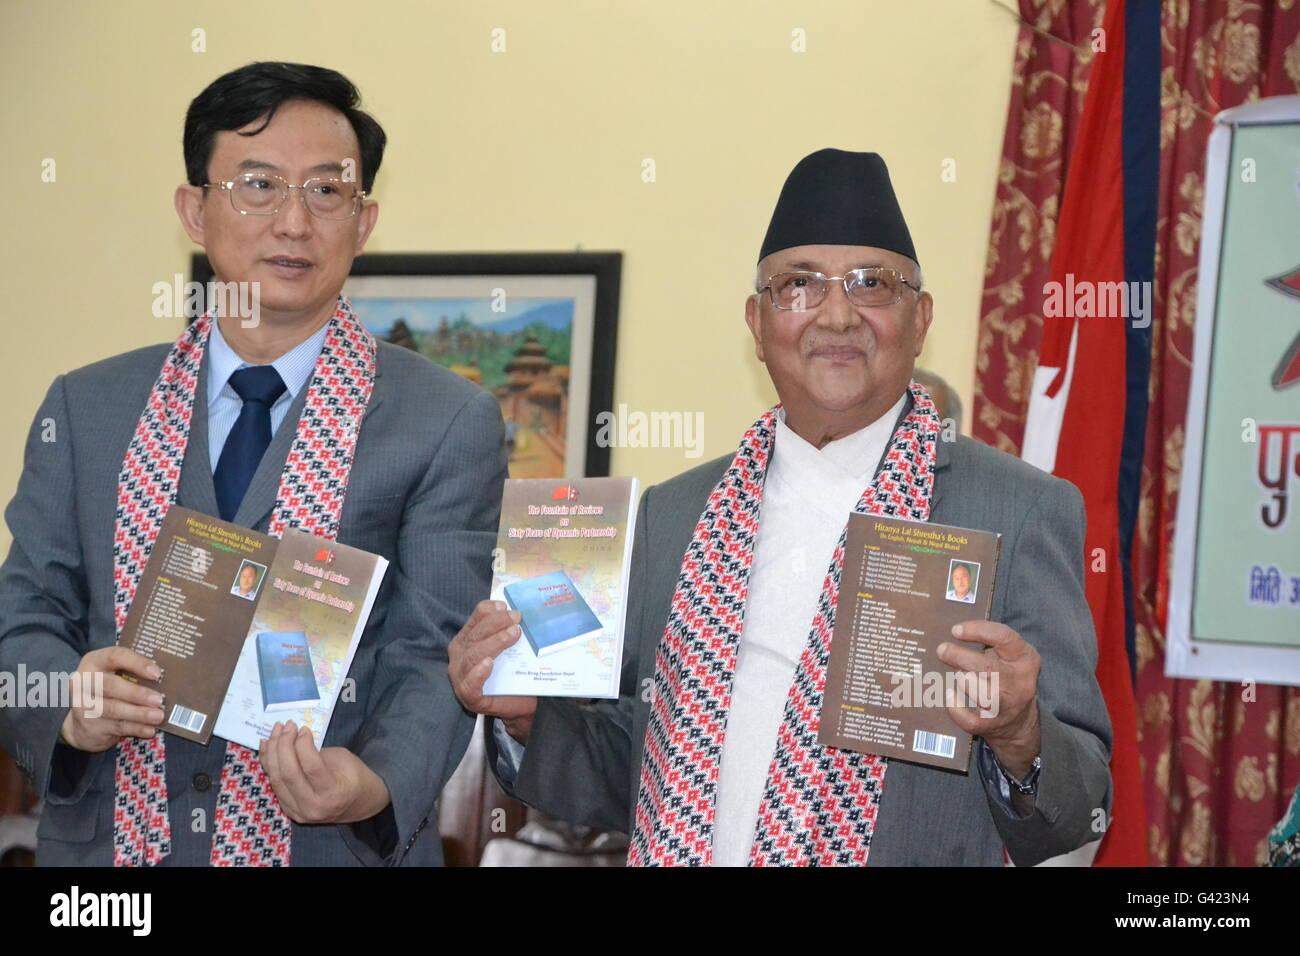 Kathmandu  17th June, 2016  Nepali Prime Minister KP Sharma